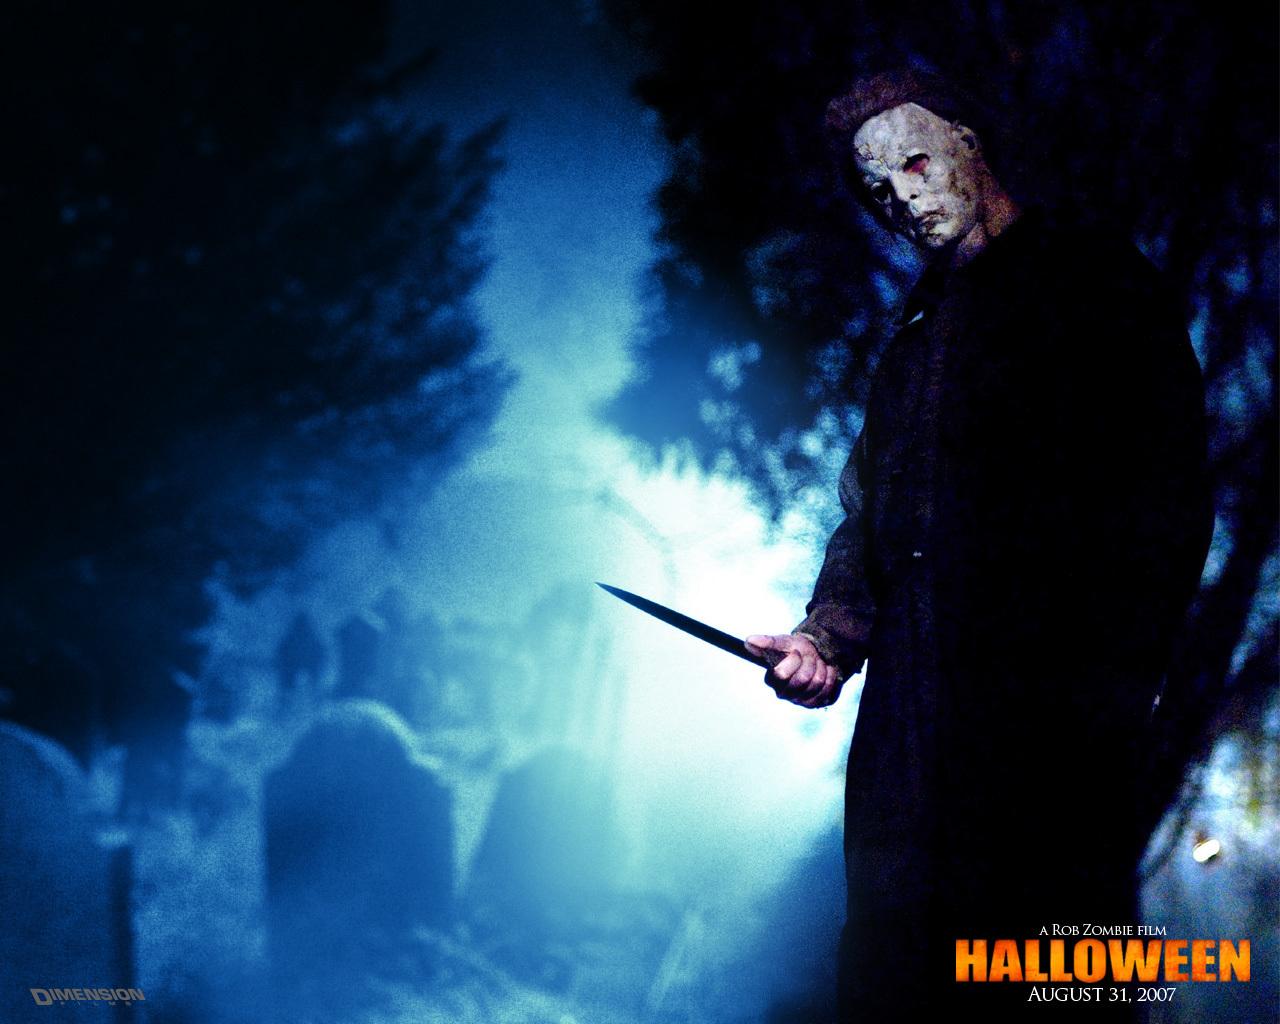 http://4.bp.blogspot.com/-TJsL9juJa0Q/TXQ6zB_Z8GI/AAAAAAAAAC0/mvyC6l1bzSI/s1600/Michael-Myers-horror-legends-3696599-1280-1024.jpg